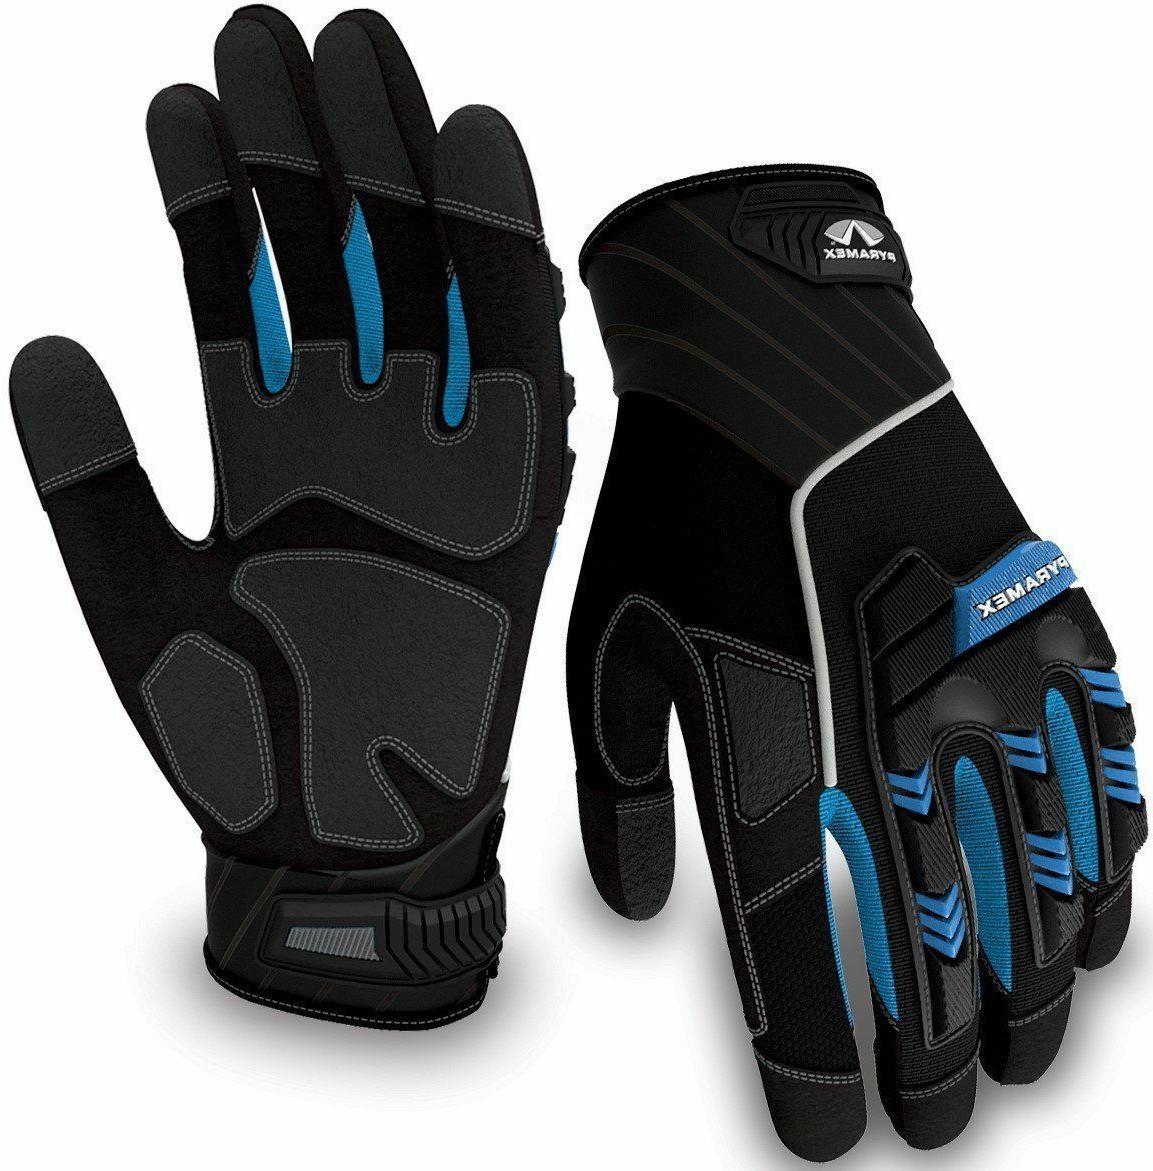 Pyramex Safety GL201 Heavy Duty Impact Work Gloves, Blue, Me